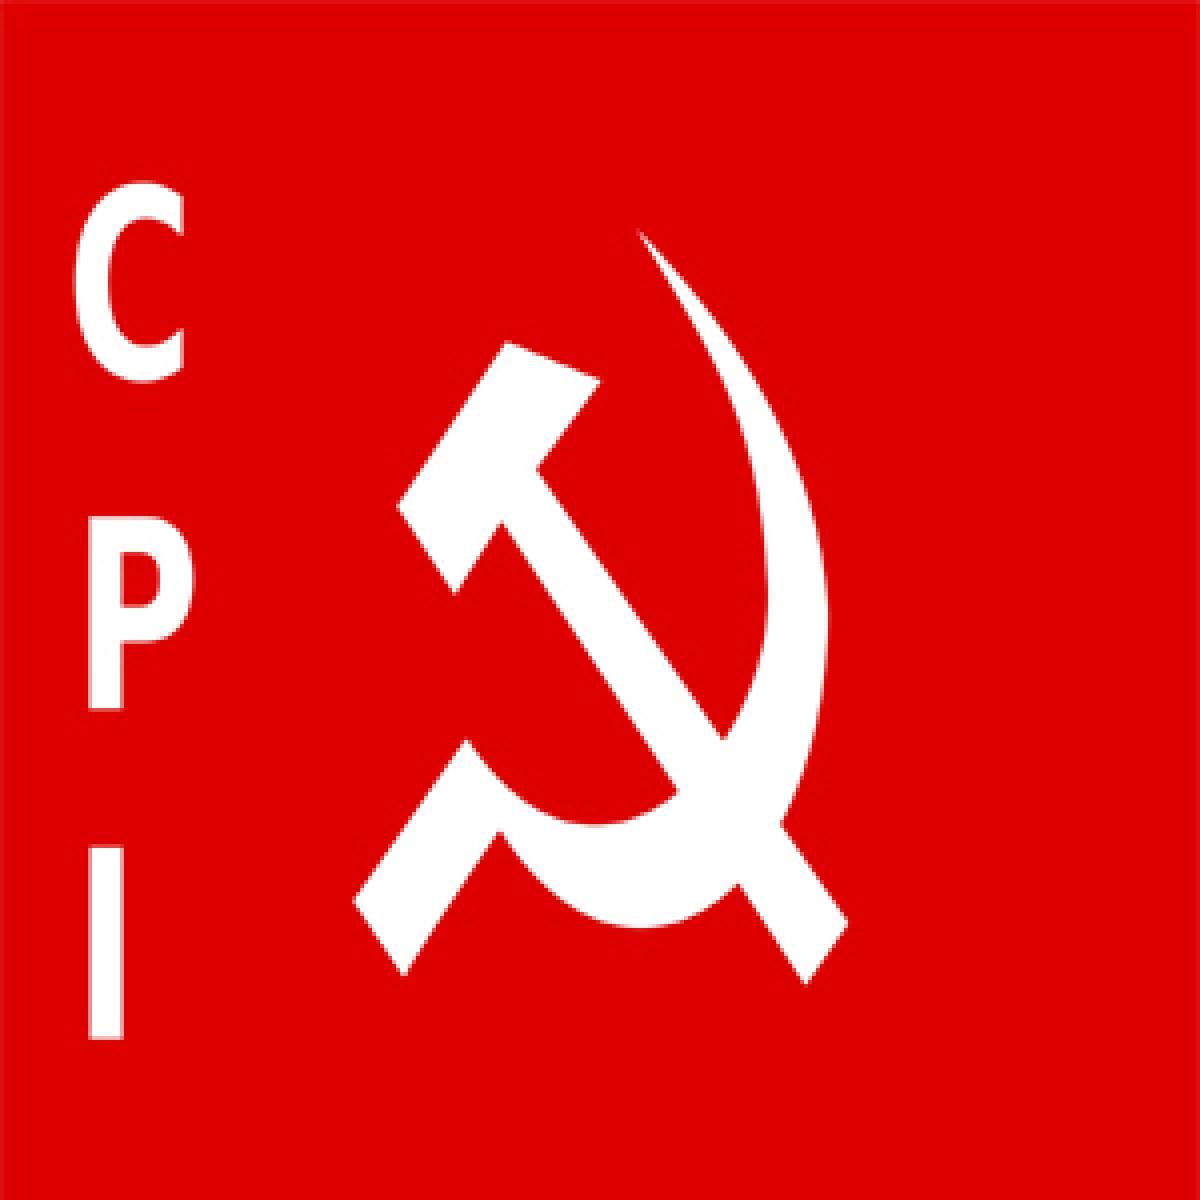 Key CPI(ML) Janashakti leader nabbed